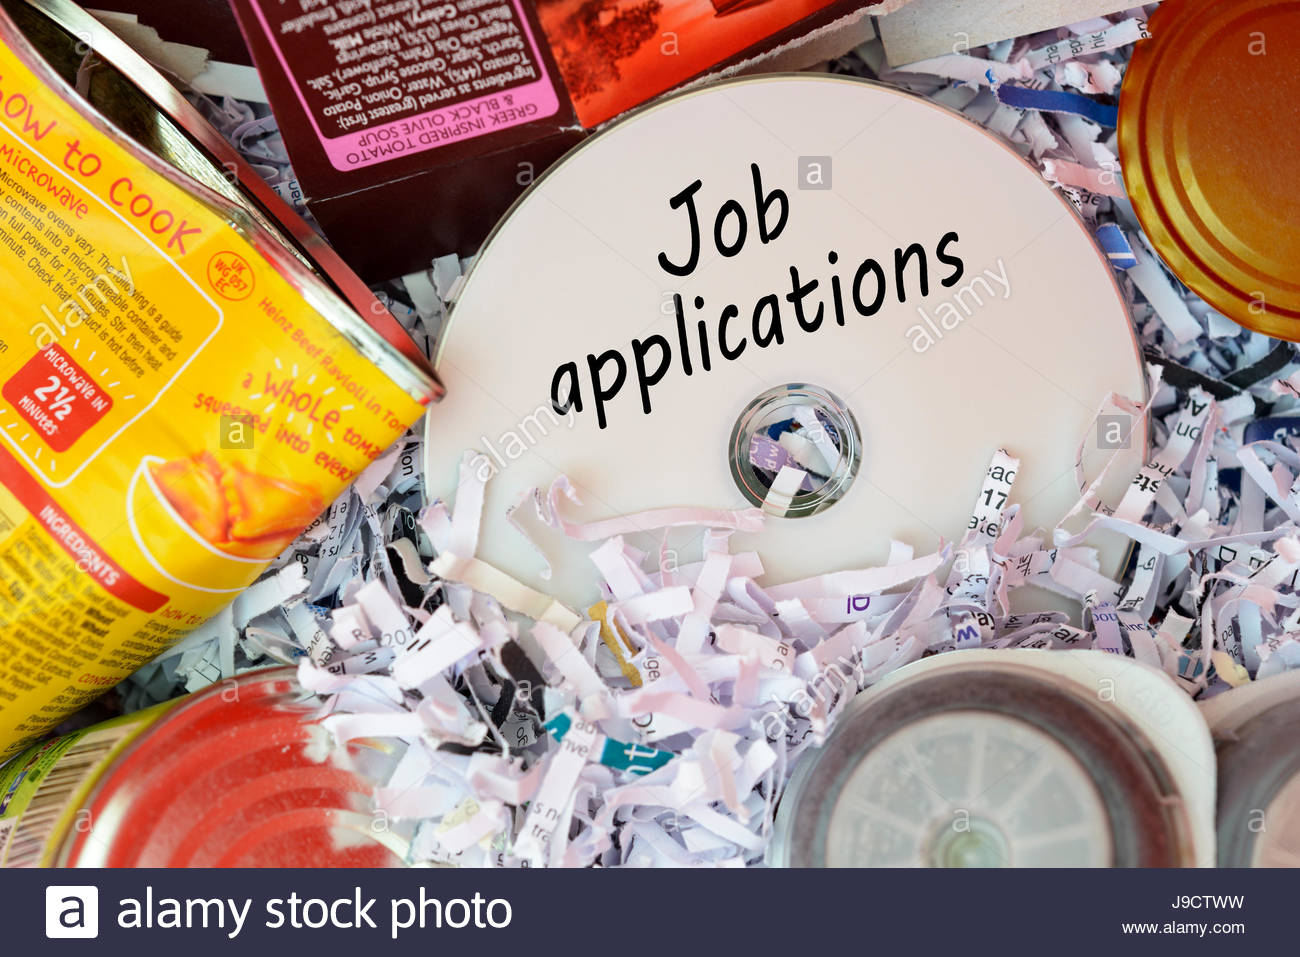 Job applications, data disc thrown in Bin, Dorset, England. Stock Photo